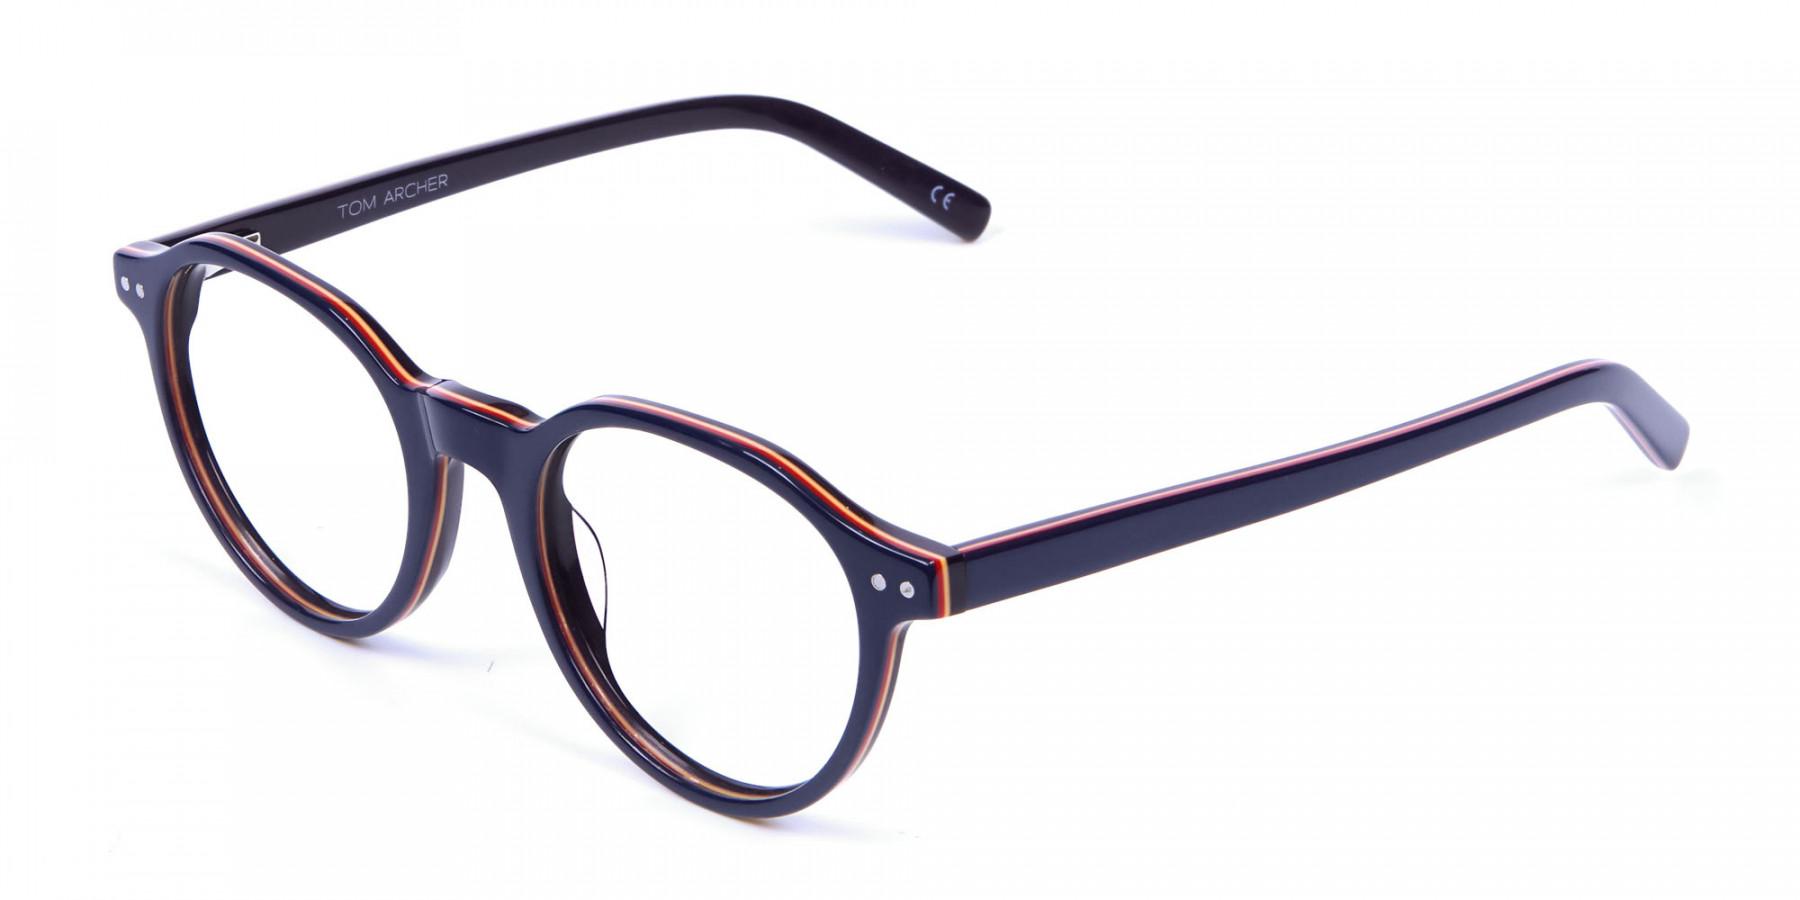 Black & Hints of Orange Eyeglasses